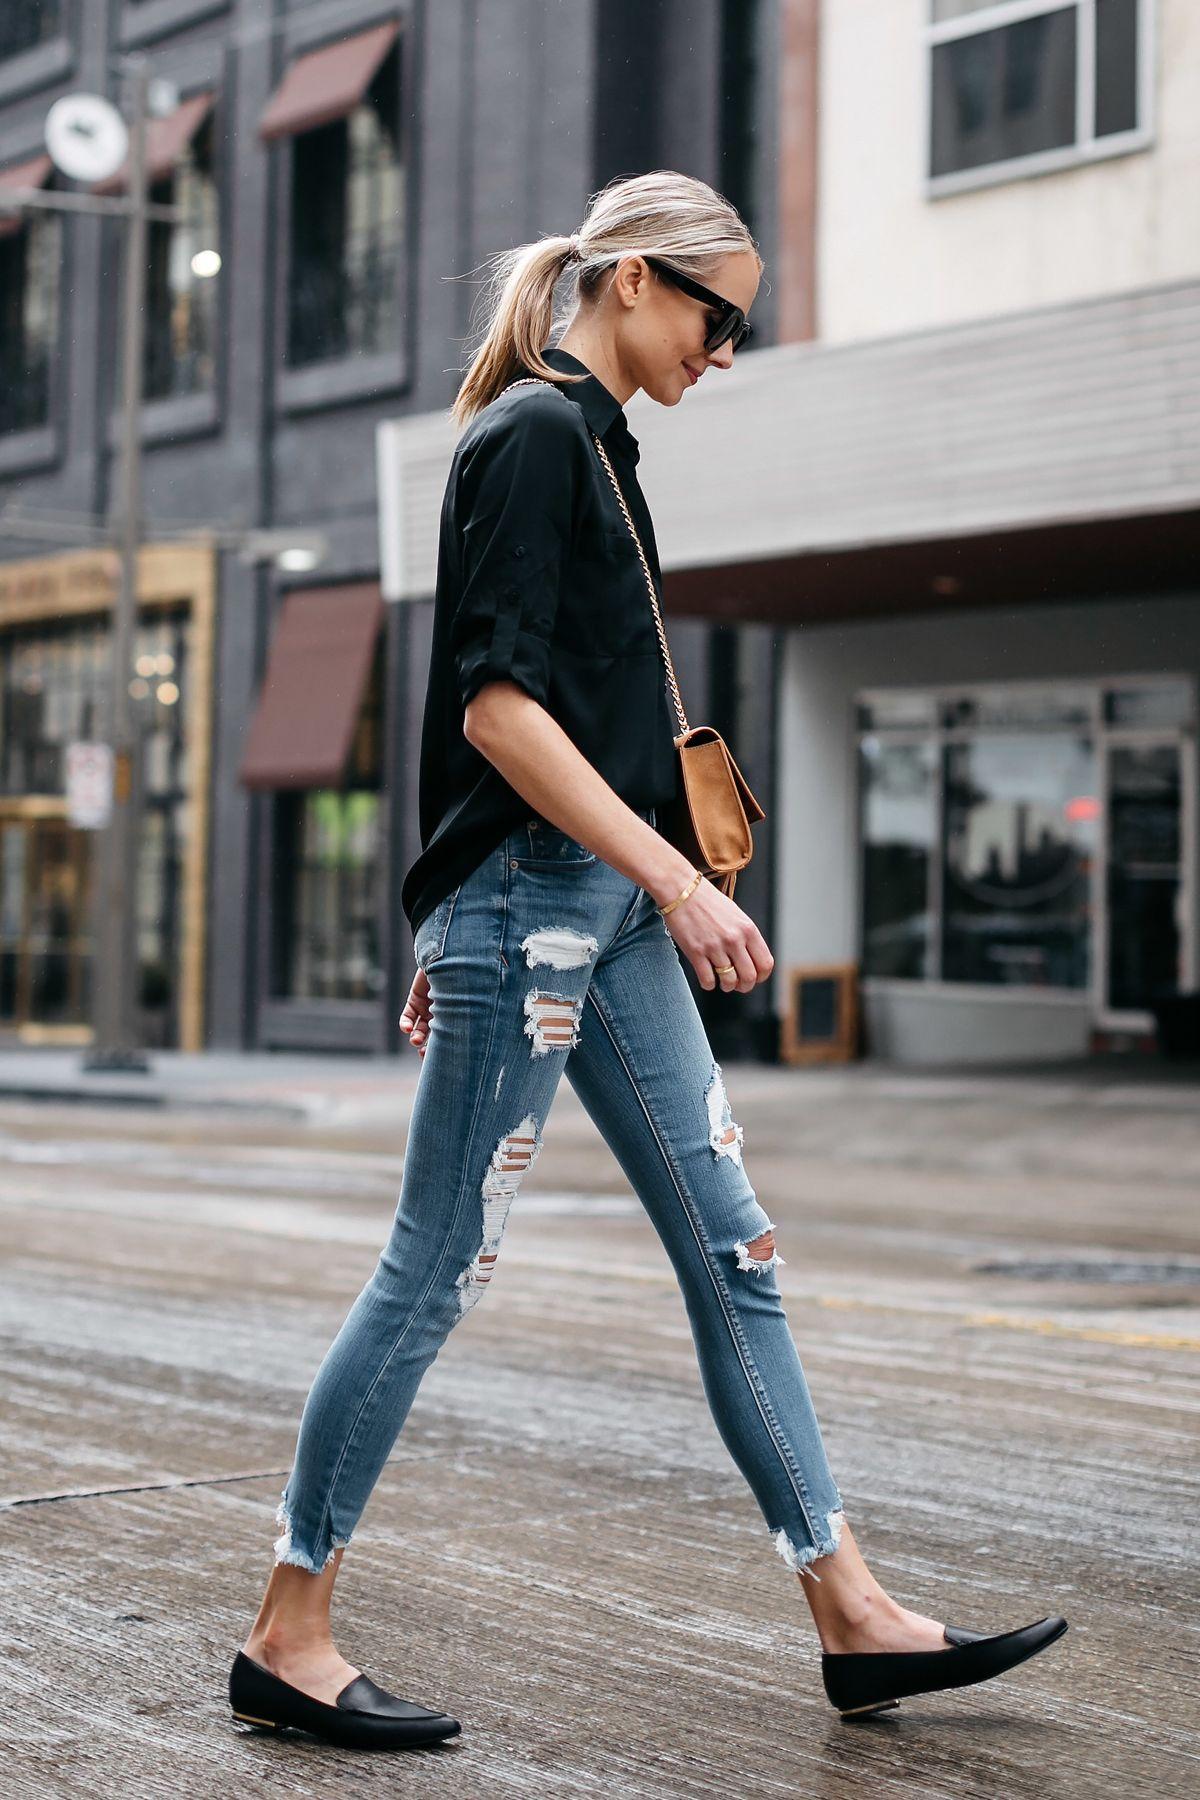 dee3ab676f80 Blonde Woman Wearing Express Black Equipment Shirt Denim Ripped Skinny Jeans  Black Loafers Fashion Jackson Dallas Blogger Fashion Blogger Street Style